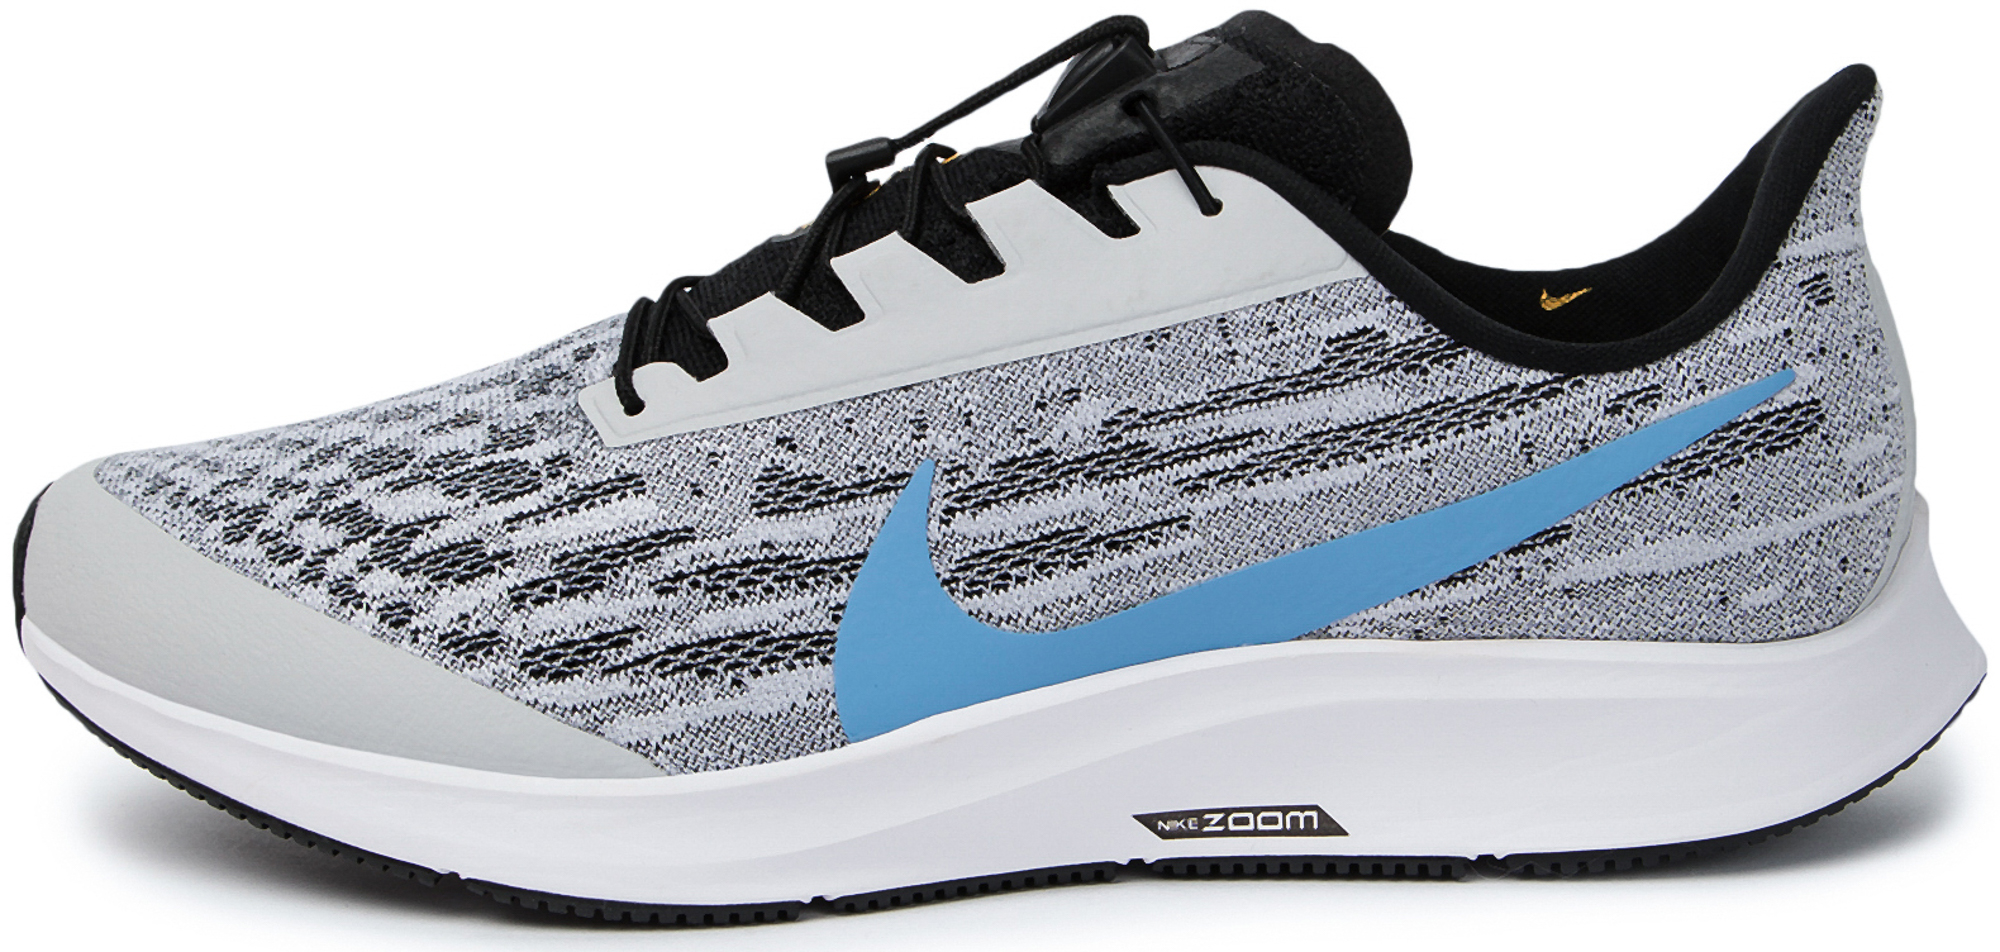 Nike Кроссовки мужские Nike Air Zm Pegasus 36 Flyease, размер 47.5